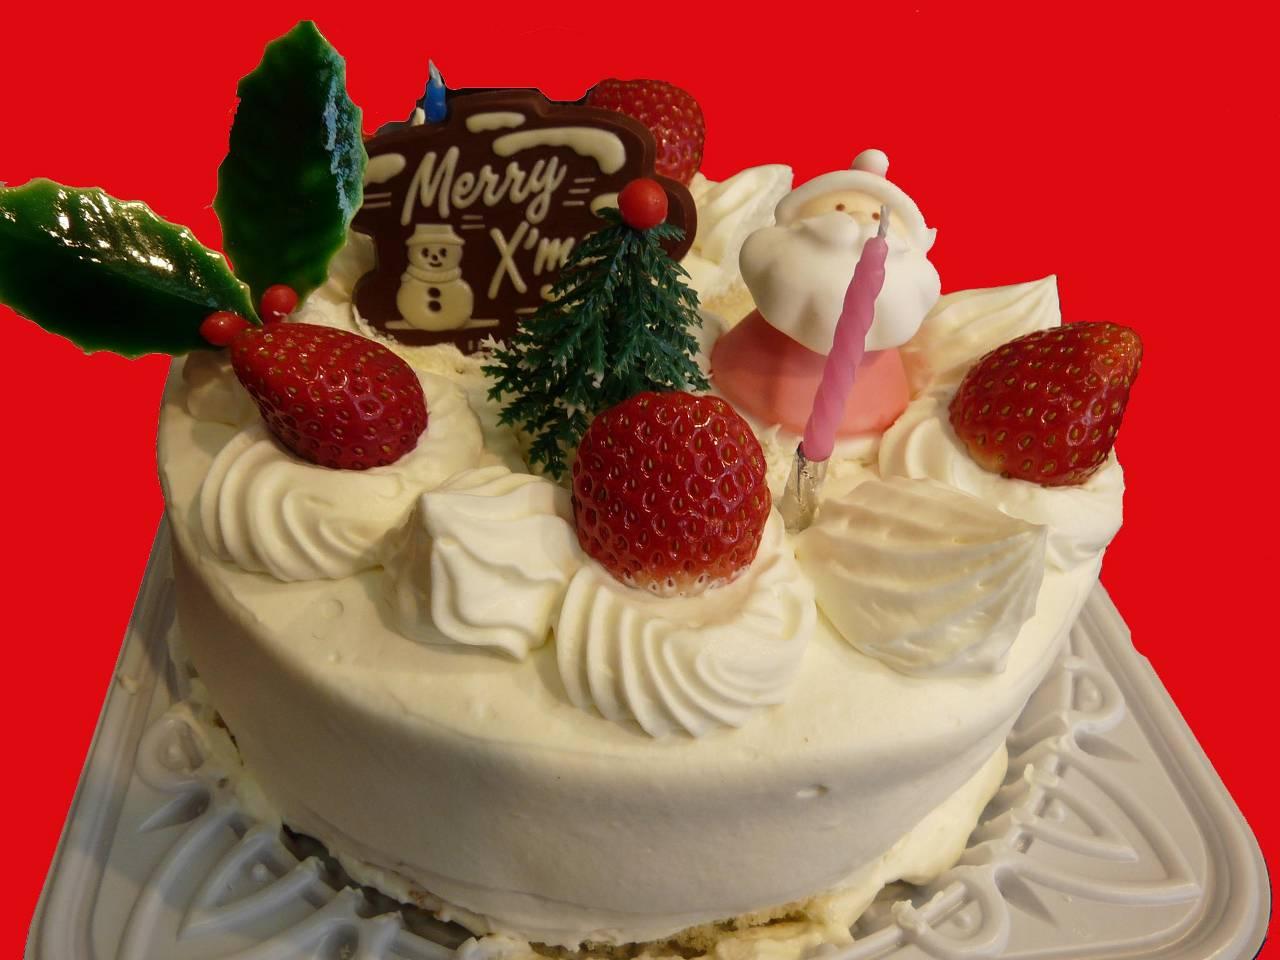 Holidays and festiviti... Mariah Carey Merry Christmas